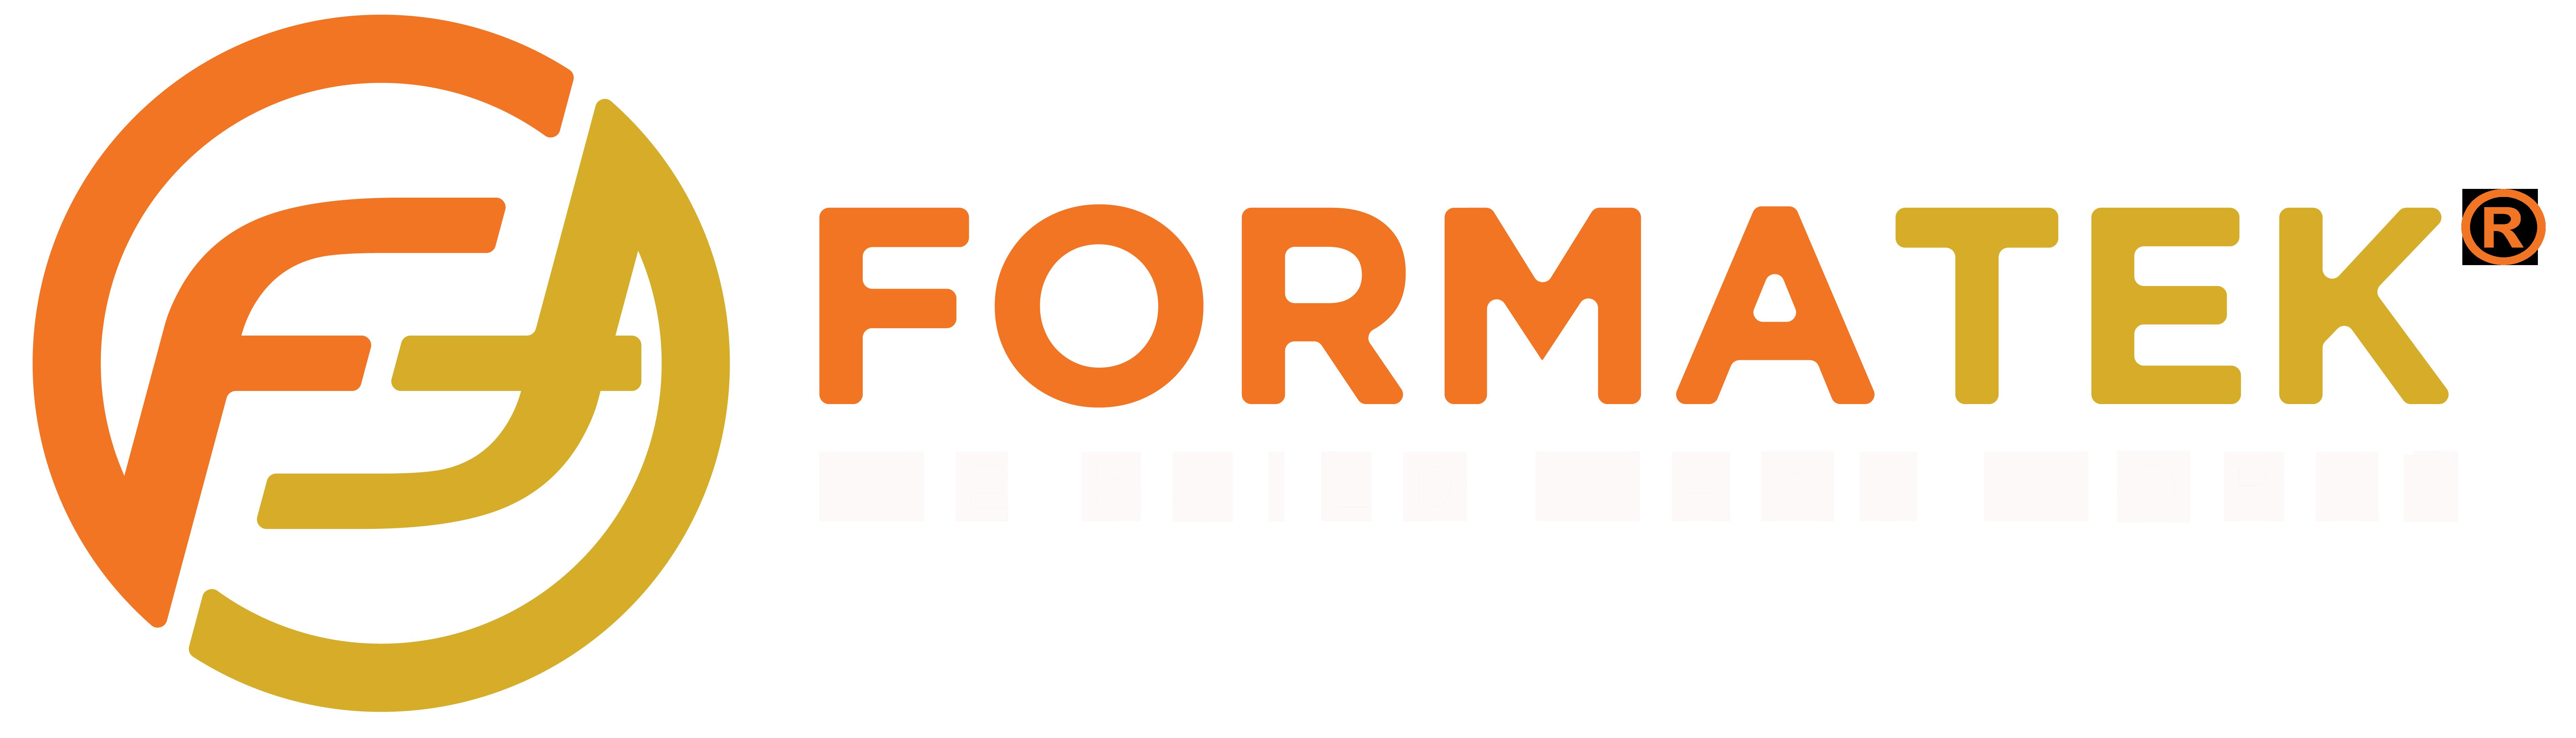 FORMATEK